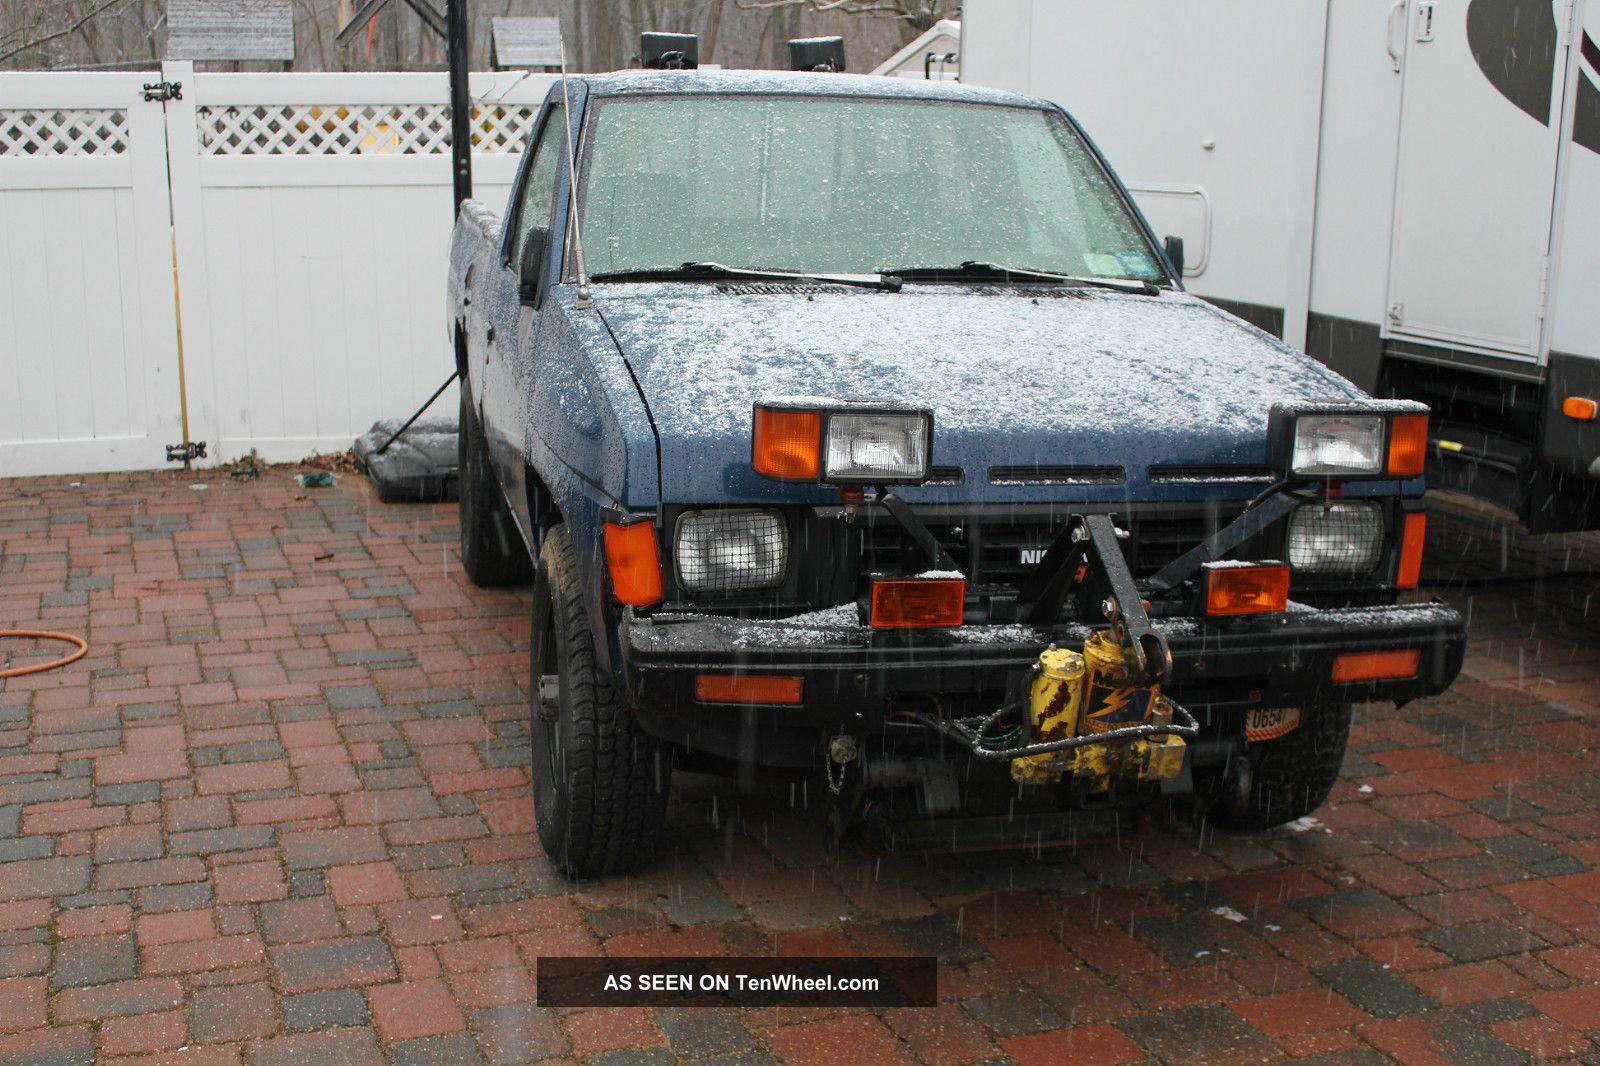 1986 Nissan Pickup Plow 4x4 Hardbody Pick Up 4wd Meyers Snowplow 4 By 4 Needs Other Pickups photo